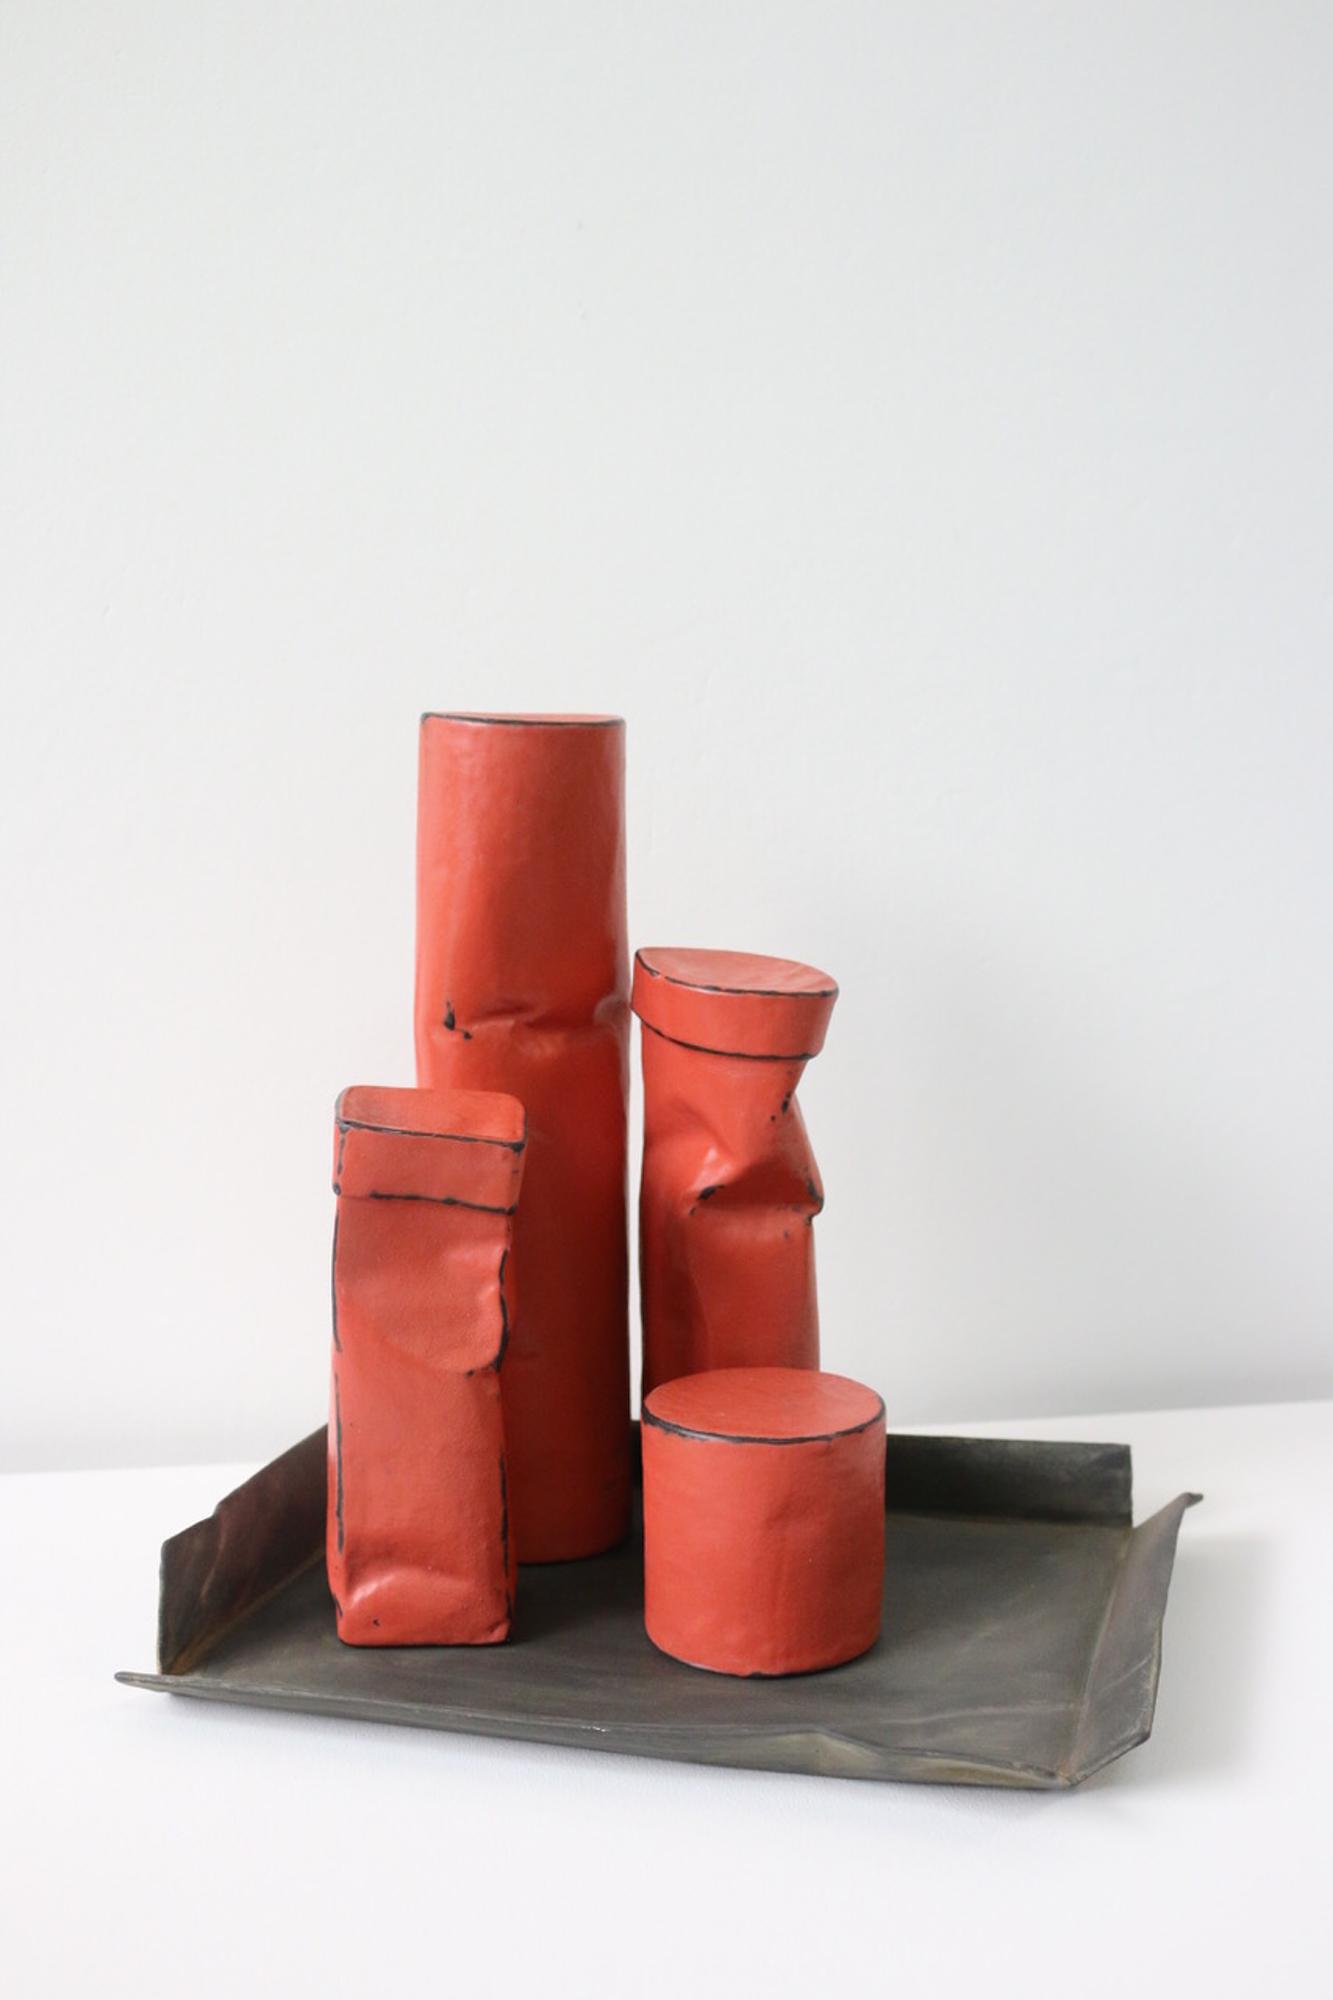 Johan De Wit, Untitled, 2018, Paper, Resin, Marble, Acrylic, 27 x 27 x 21 cm, Affinity Art